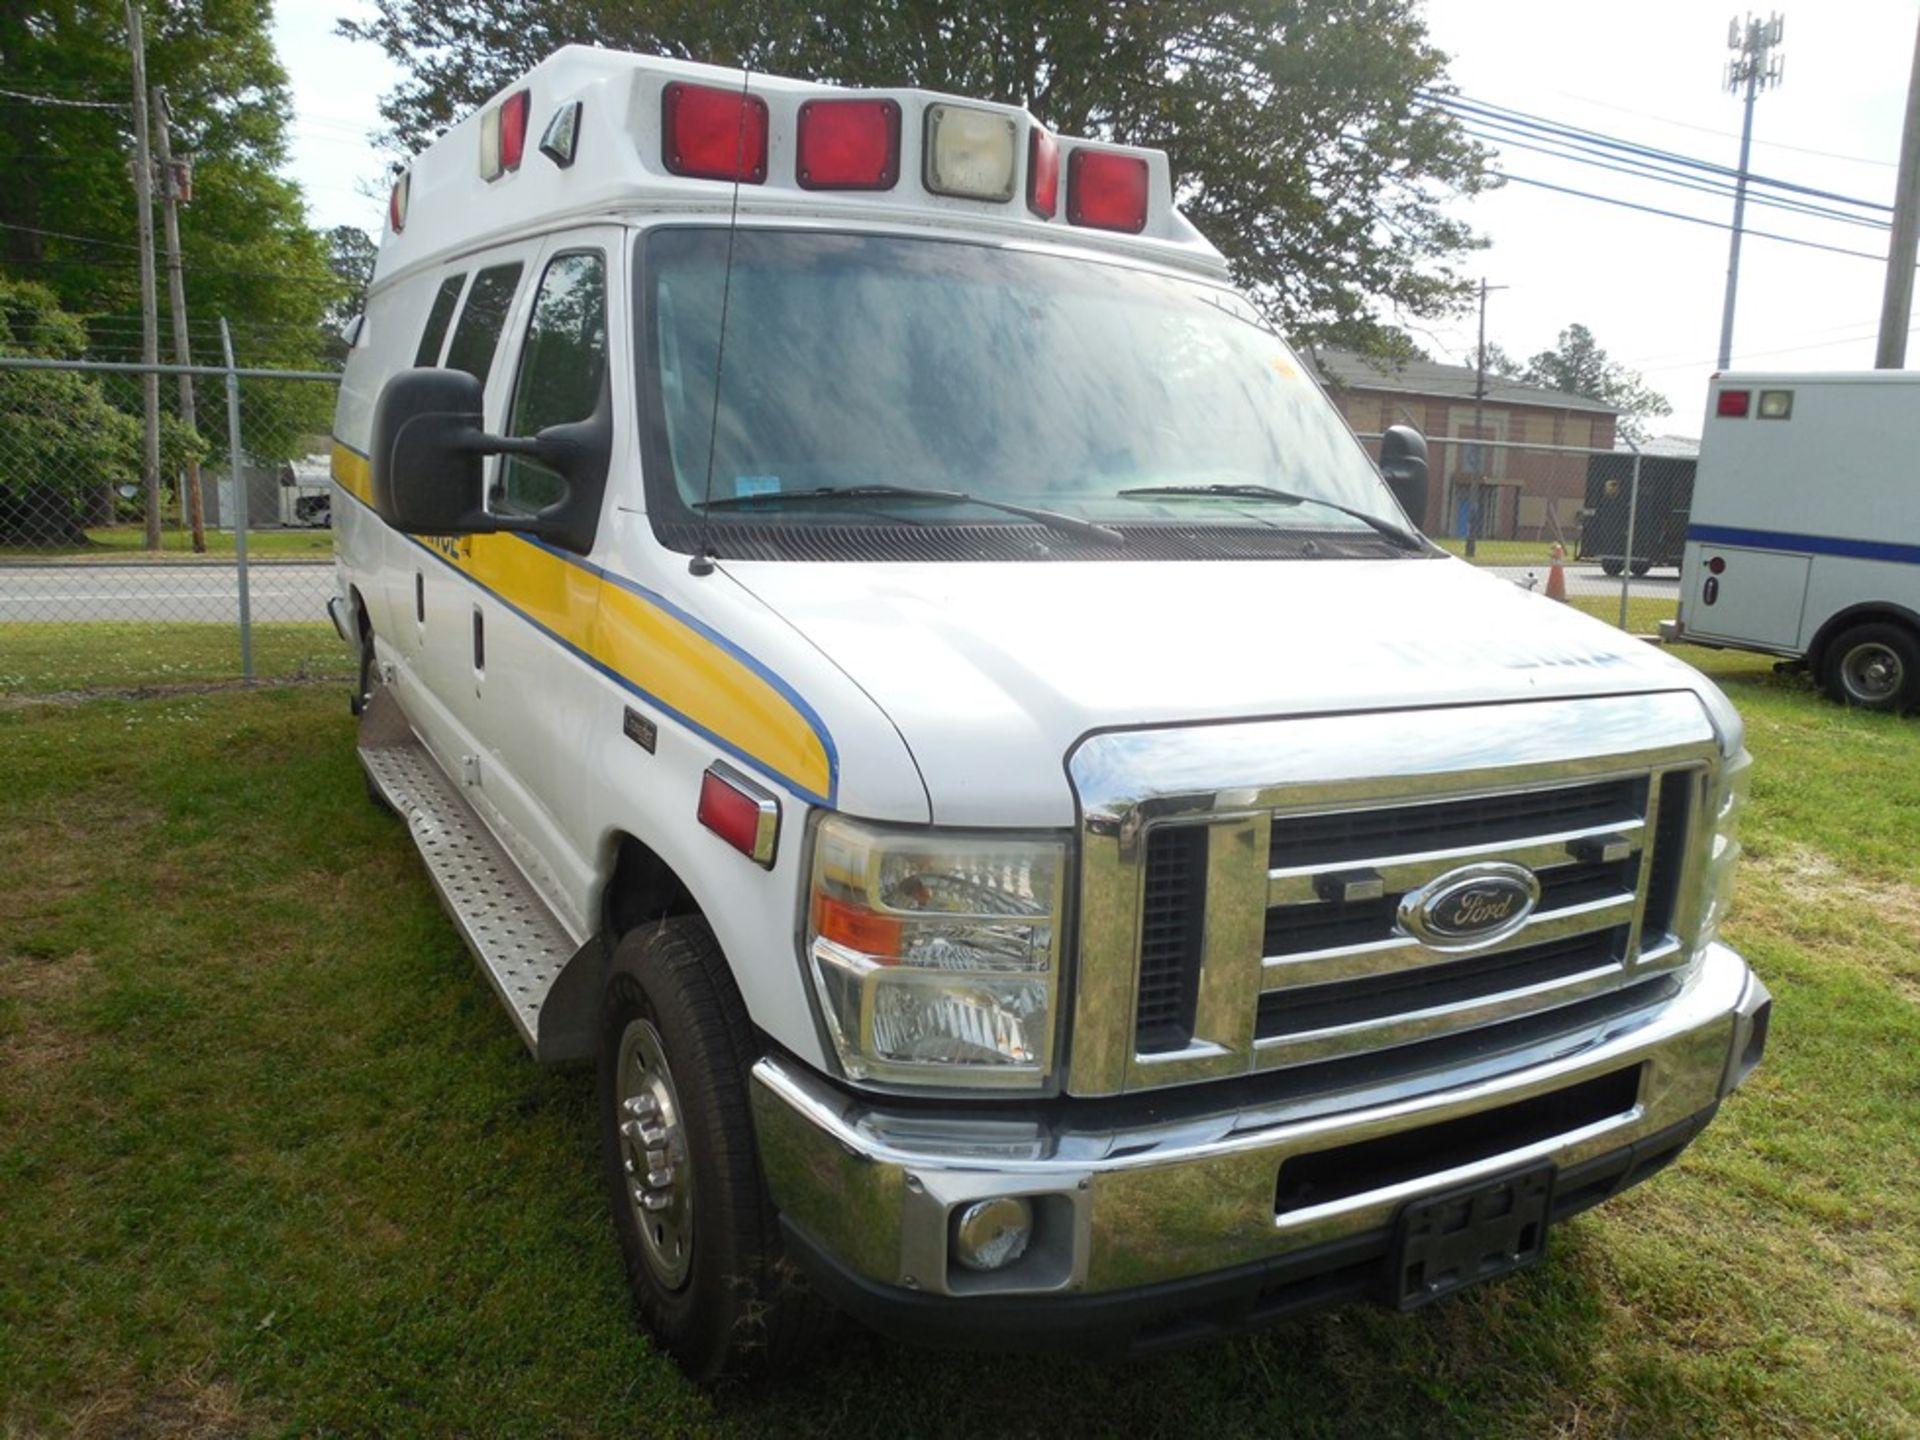 2010 Ford E350 Crusader Wheel Coach van ambulance 214,465 miles vin# 1FDSS3EP9ADA32493 - Image 3 of 6